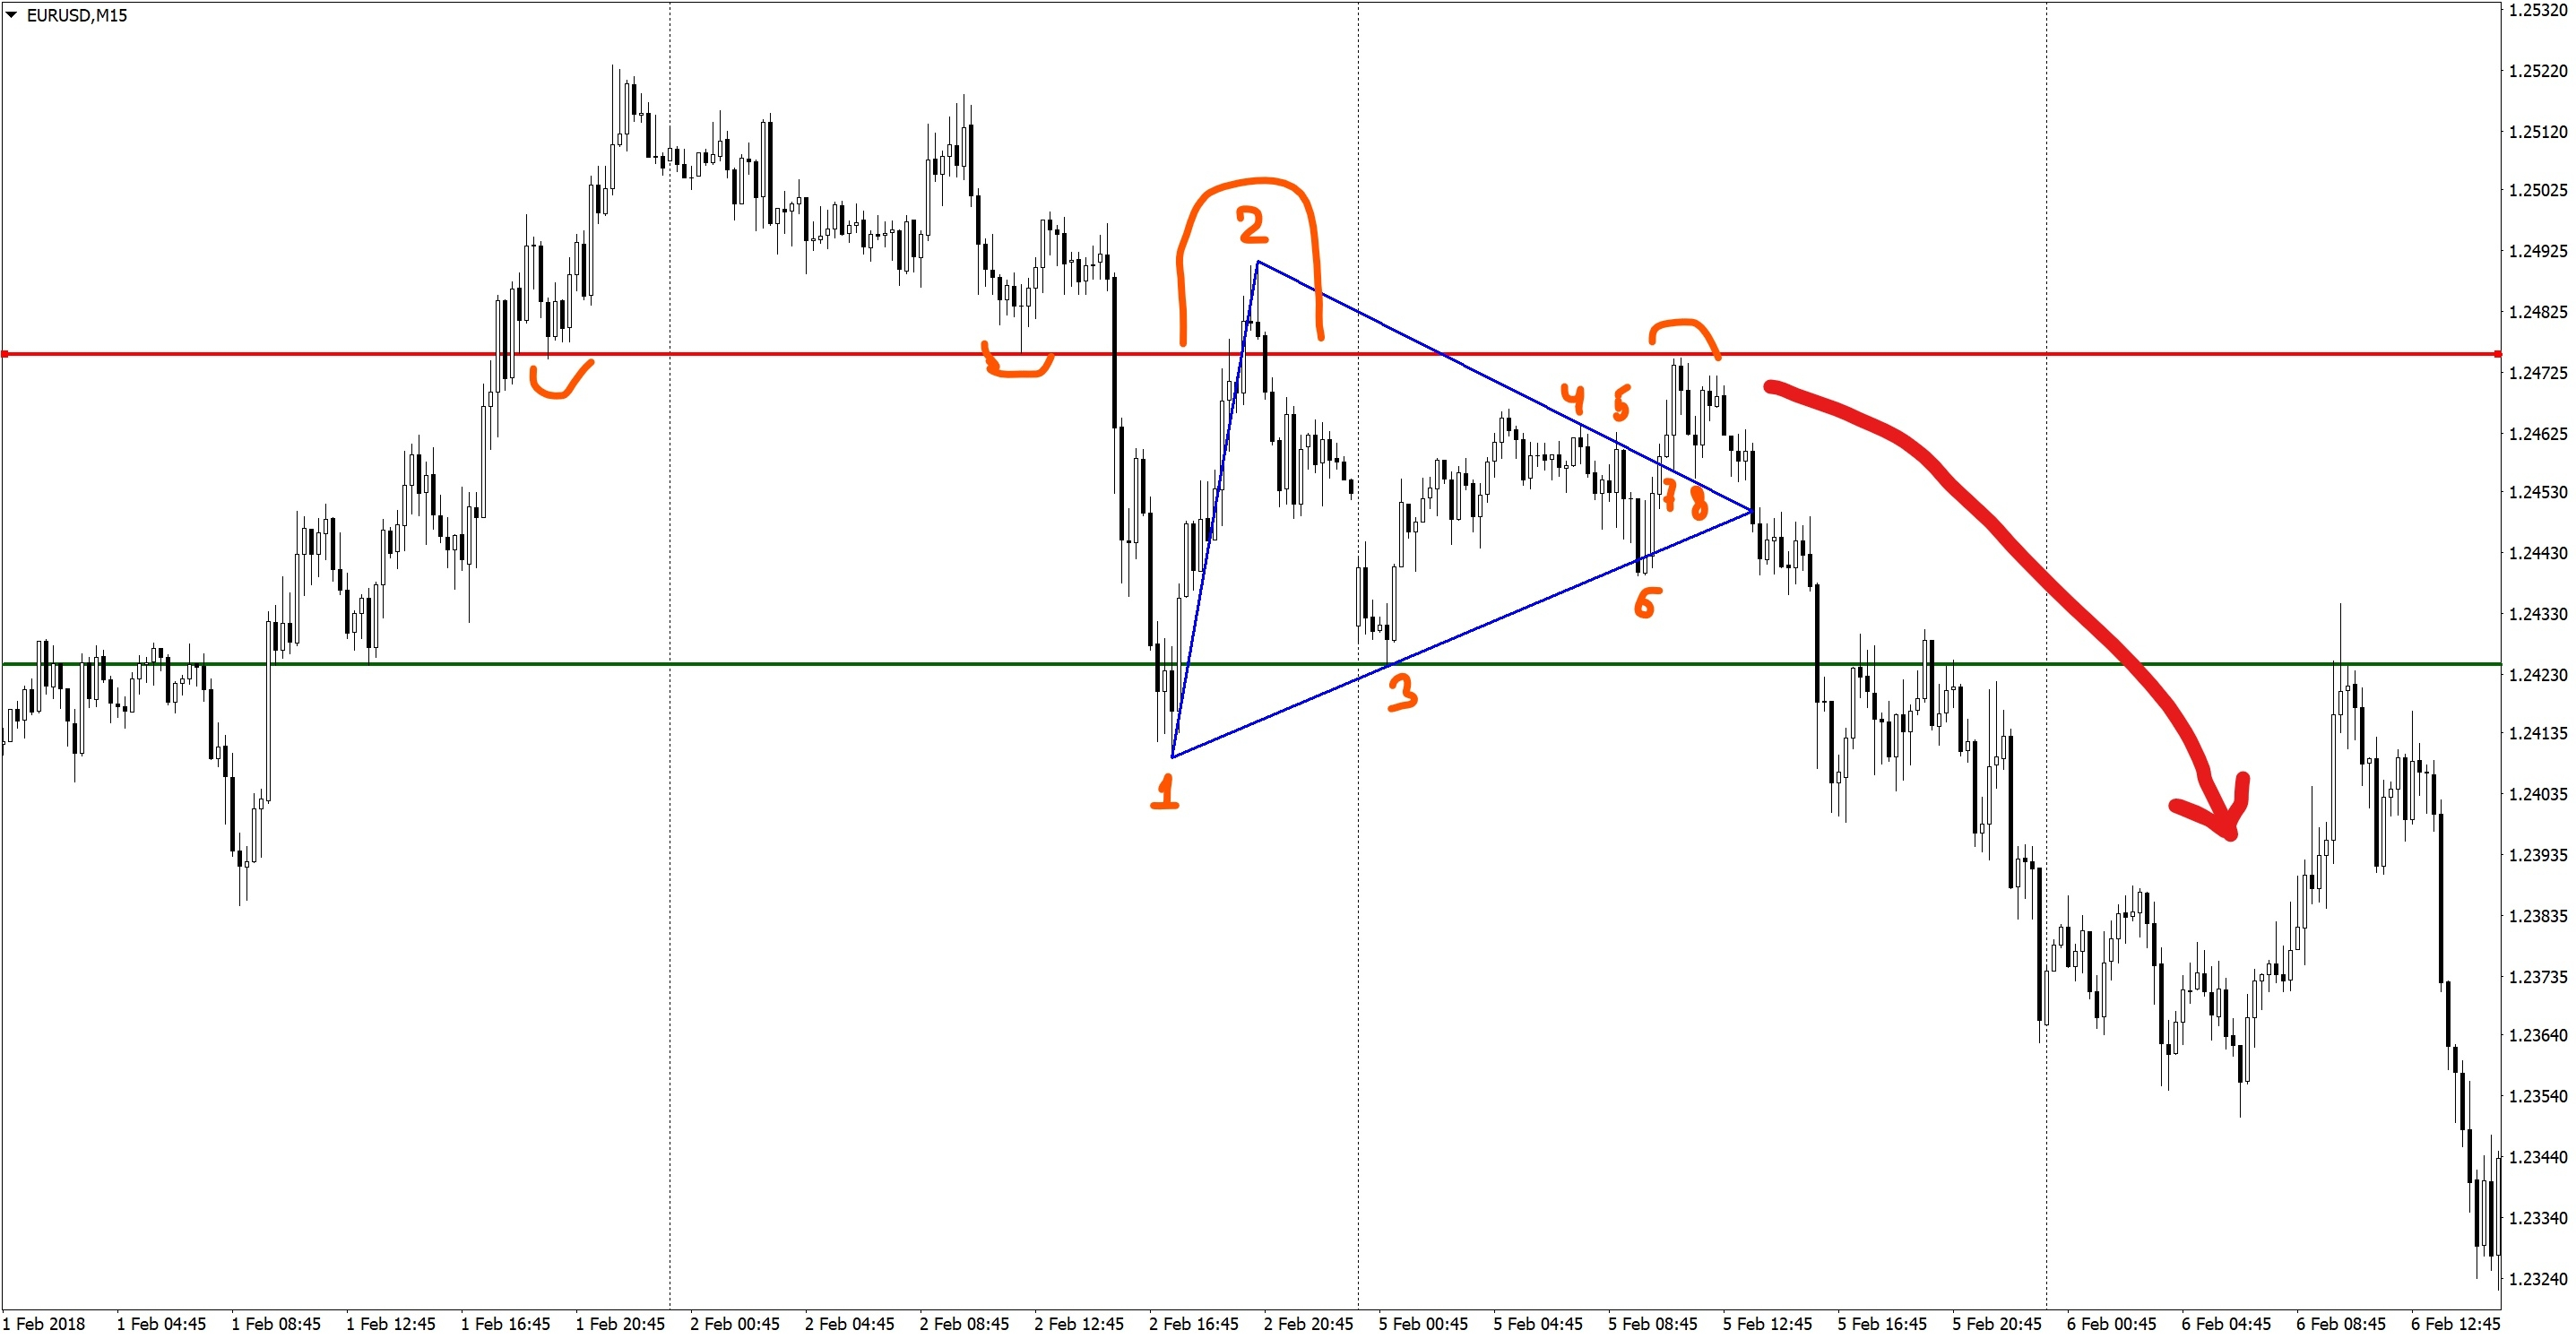 Анализ EURUSD M15-треугольник